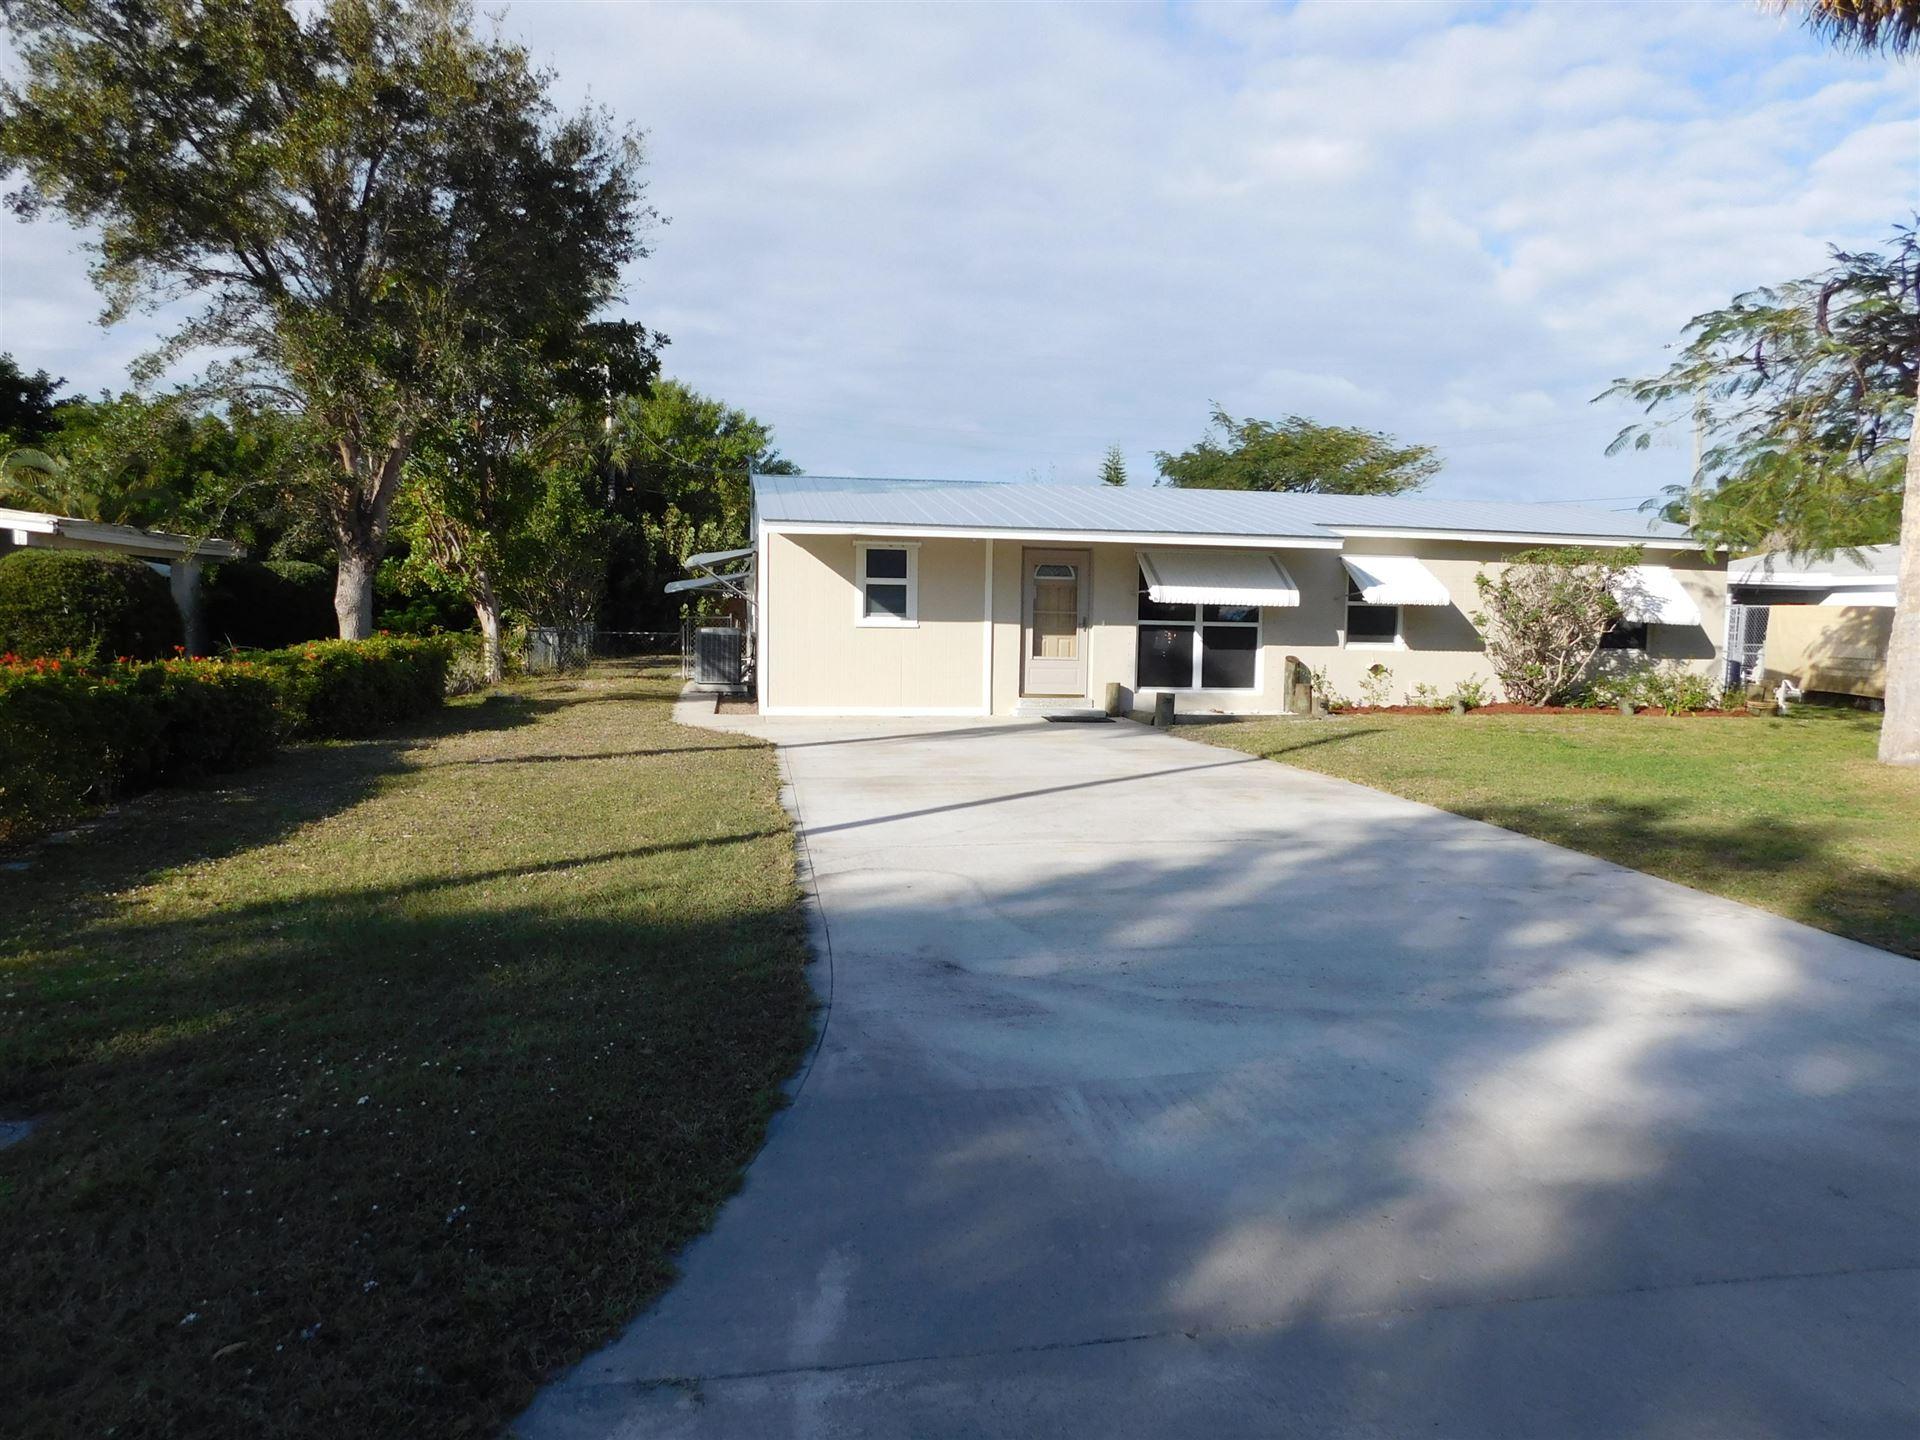 2635 NE Letitia Street, Jensen Beach, FL 34957 - #: RX-10595989